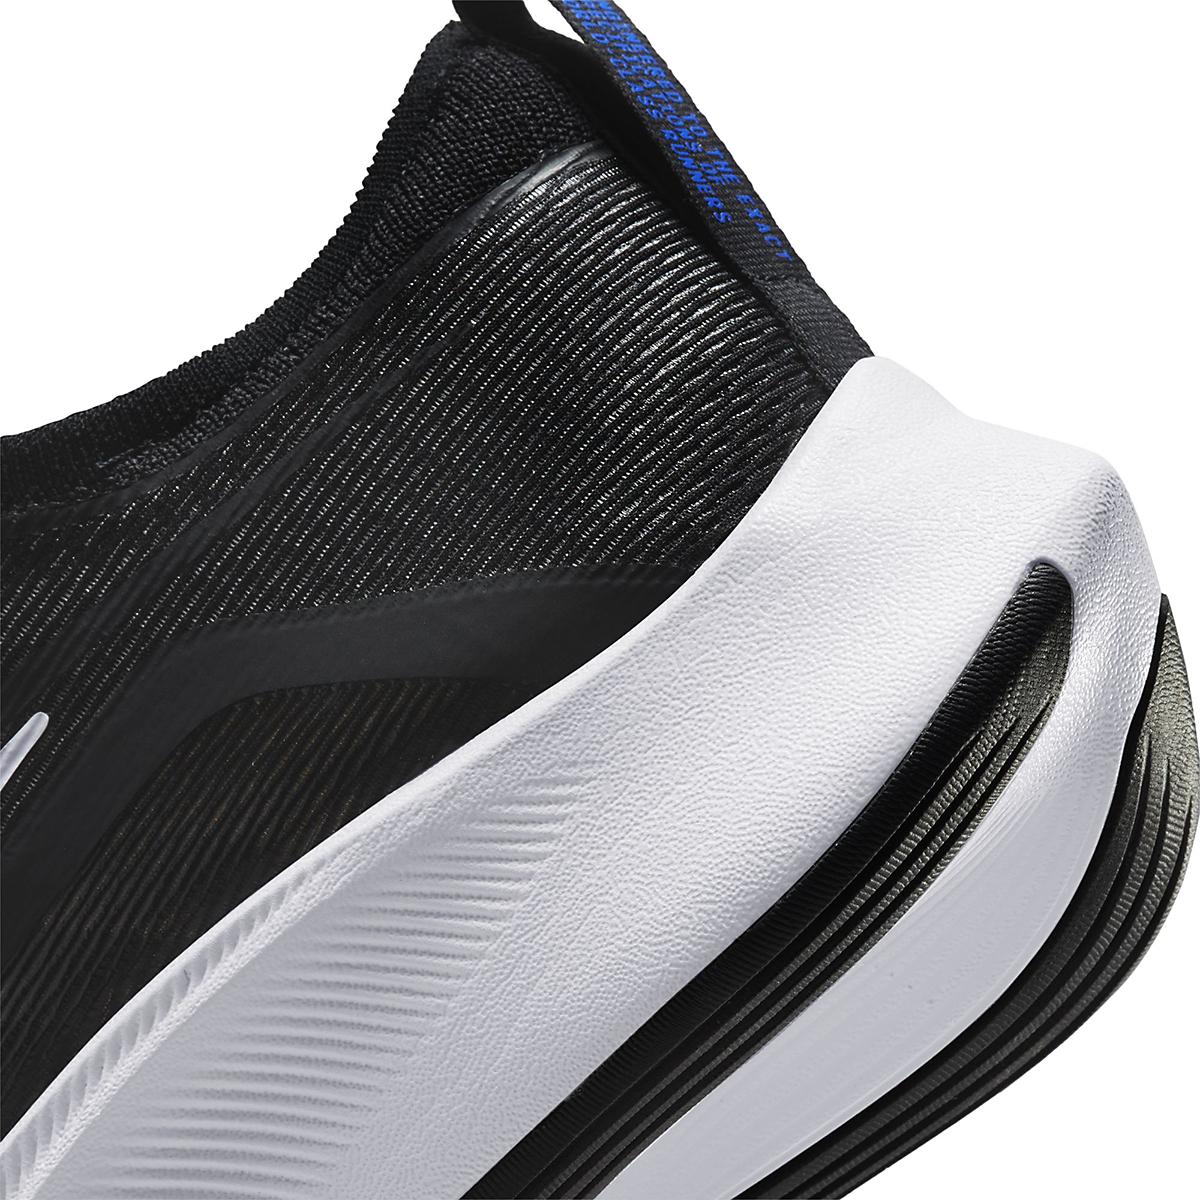 Men's Nike Zoom Fly 4 Running Shoe - Color: Black/White/Anthracite/Racer Blue - Size: 6 - Width: Regular, Black/White/Anthracite/Racer Blue, large, image 4